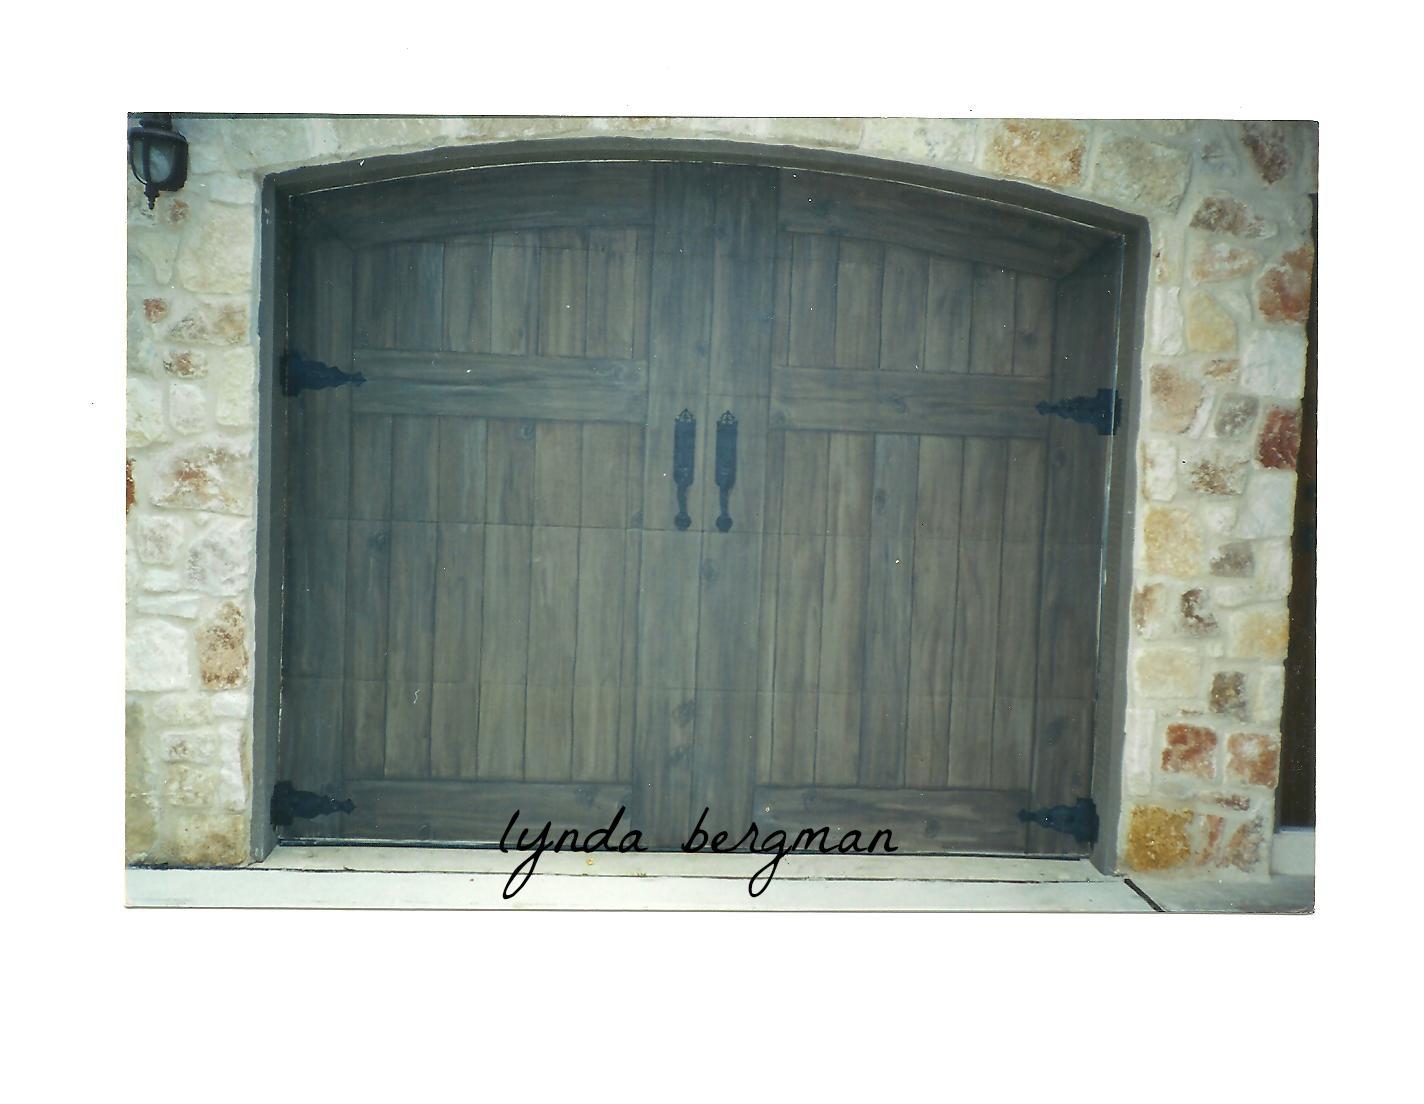 LYNDA BERGMAN DECORATIVE ARTISAN: TROMPE L'OEIL GARAGE ...